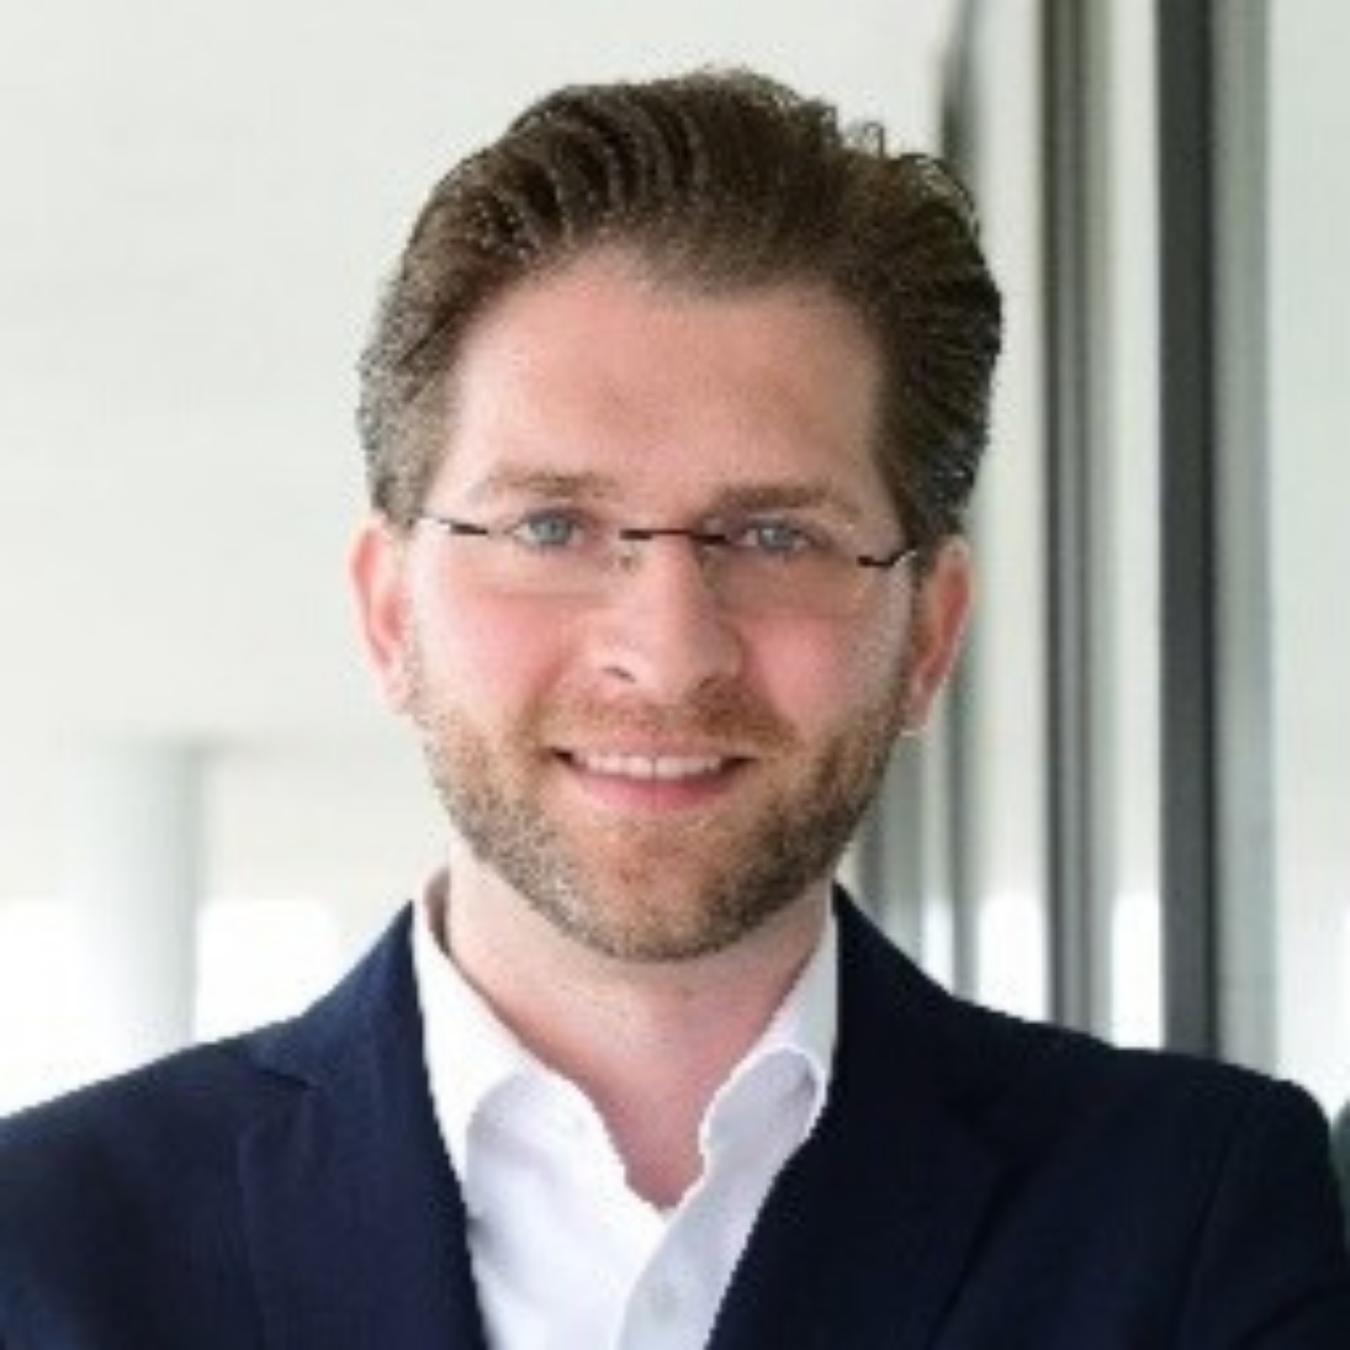 Thomas Knauff